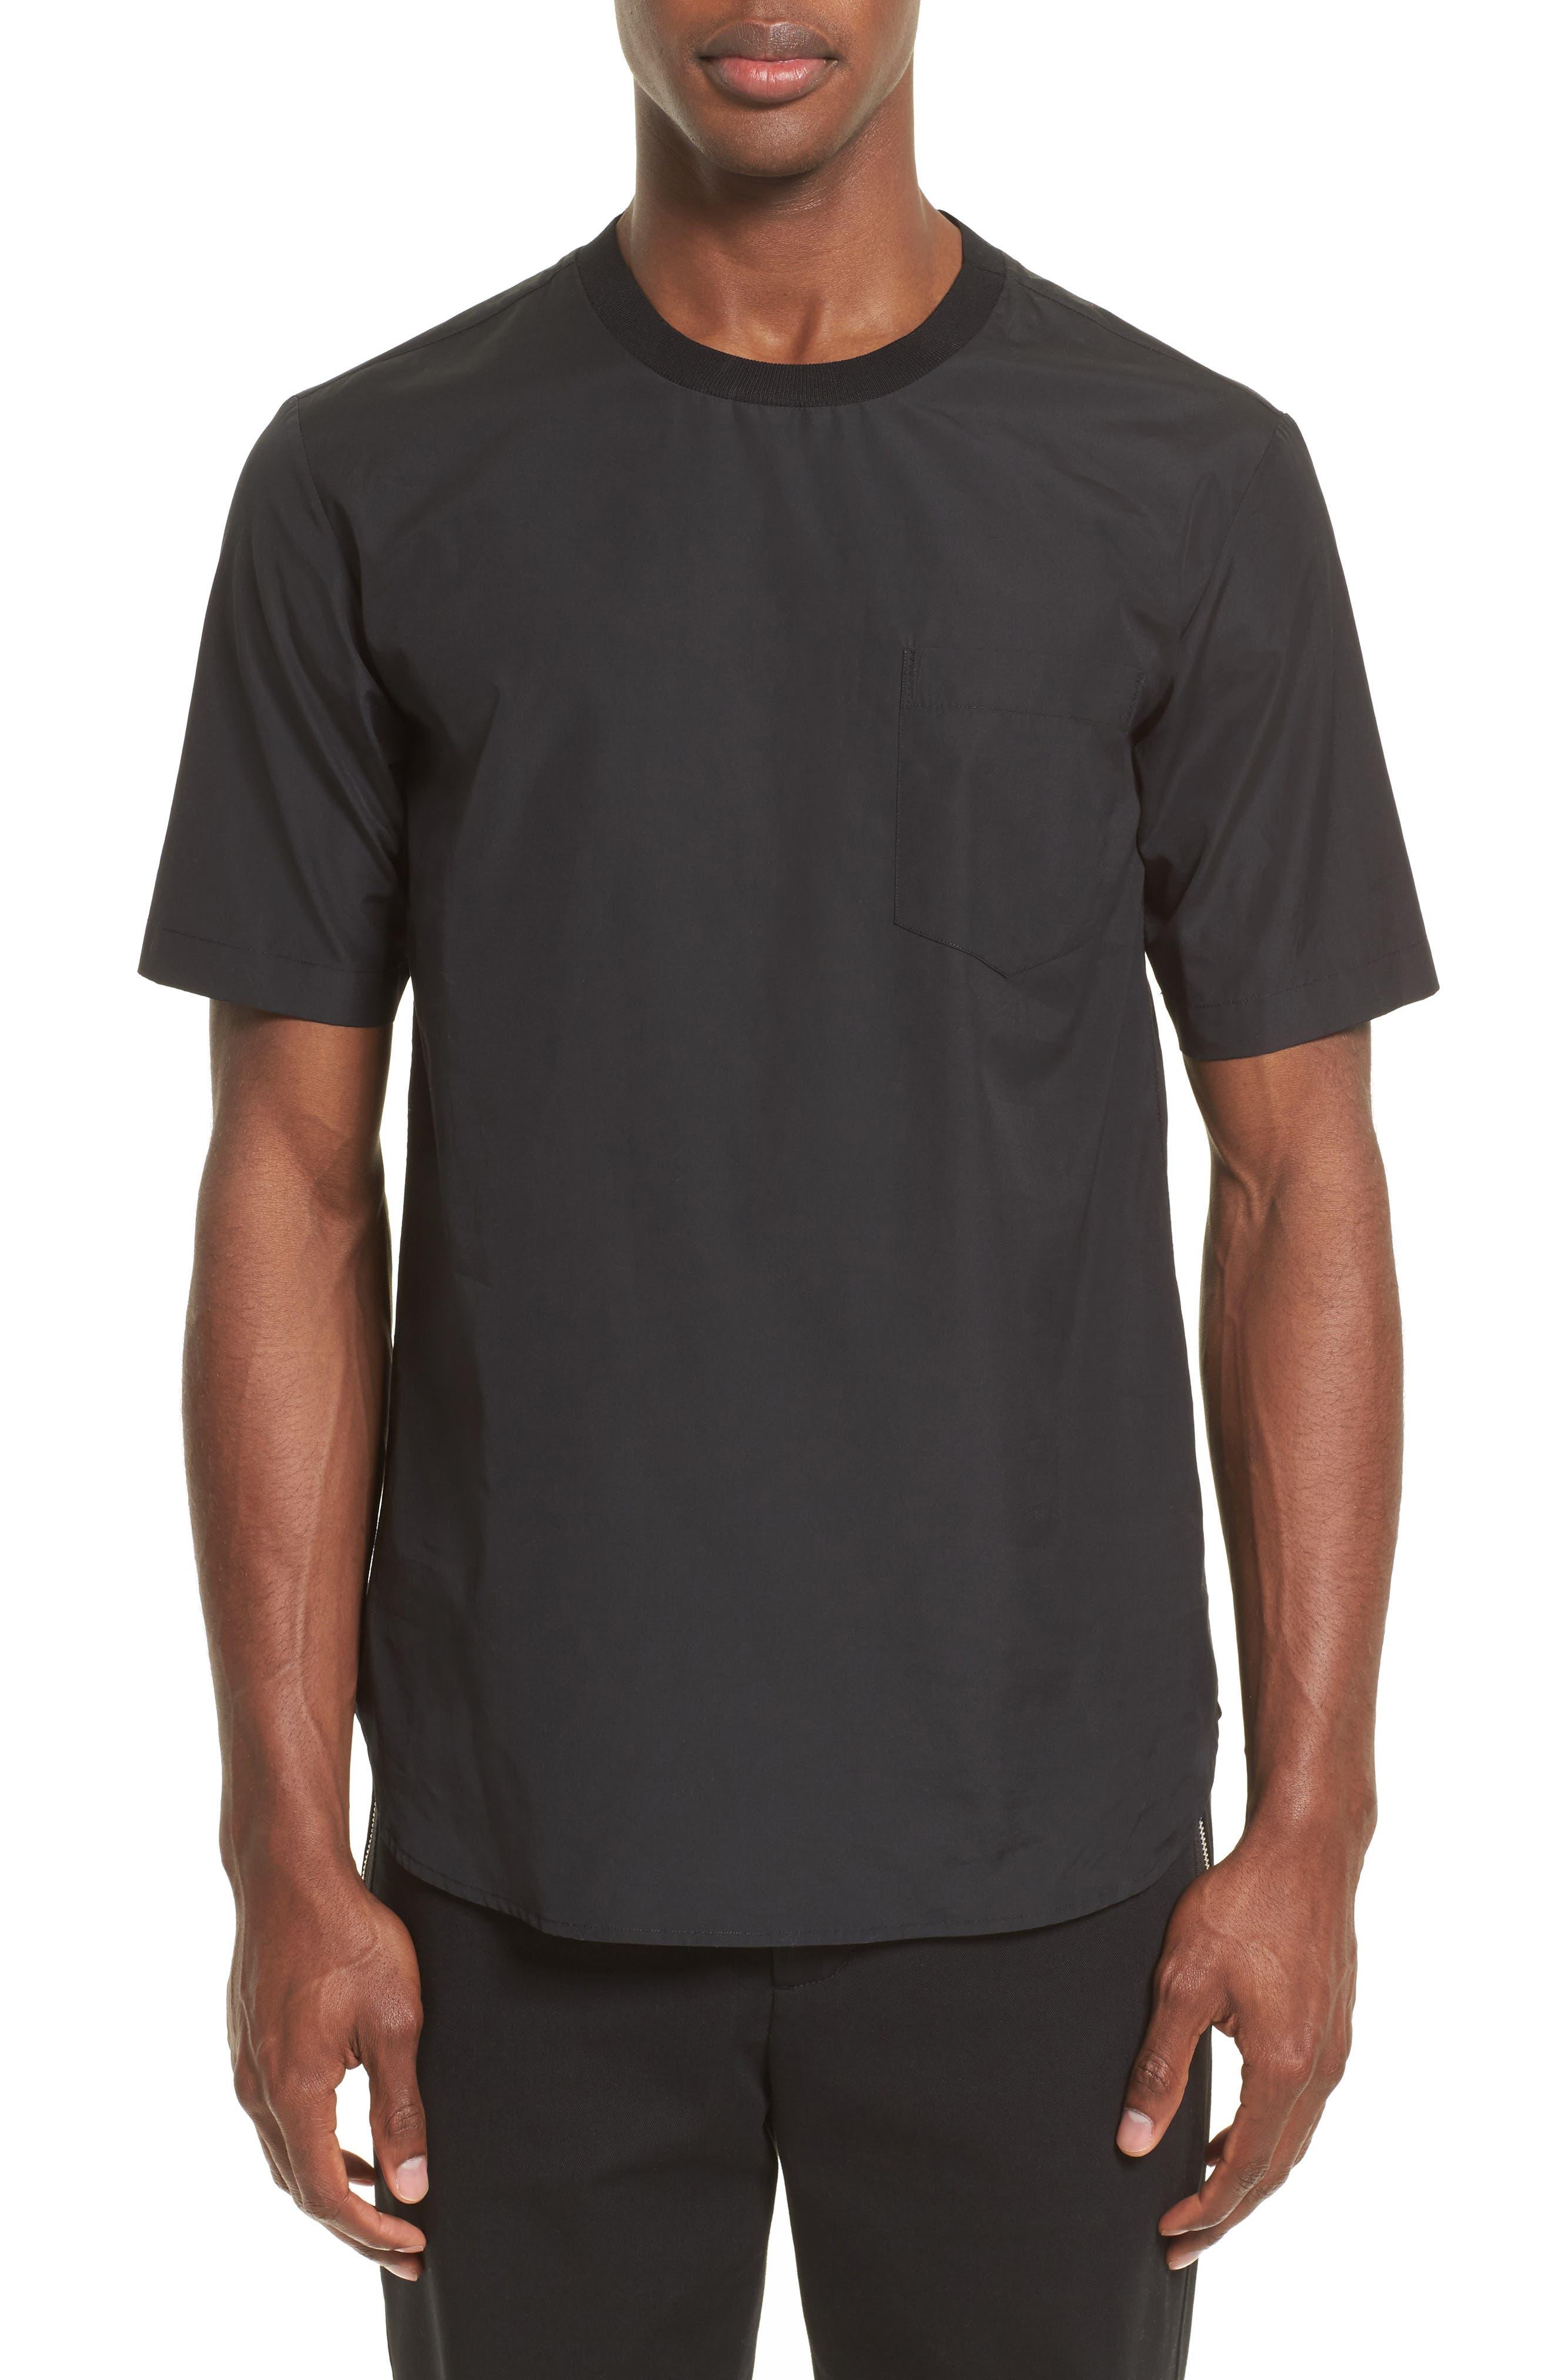 3.1 Phillip Lim Pocket T-Shirt